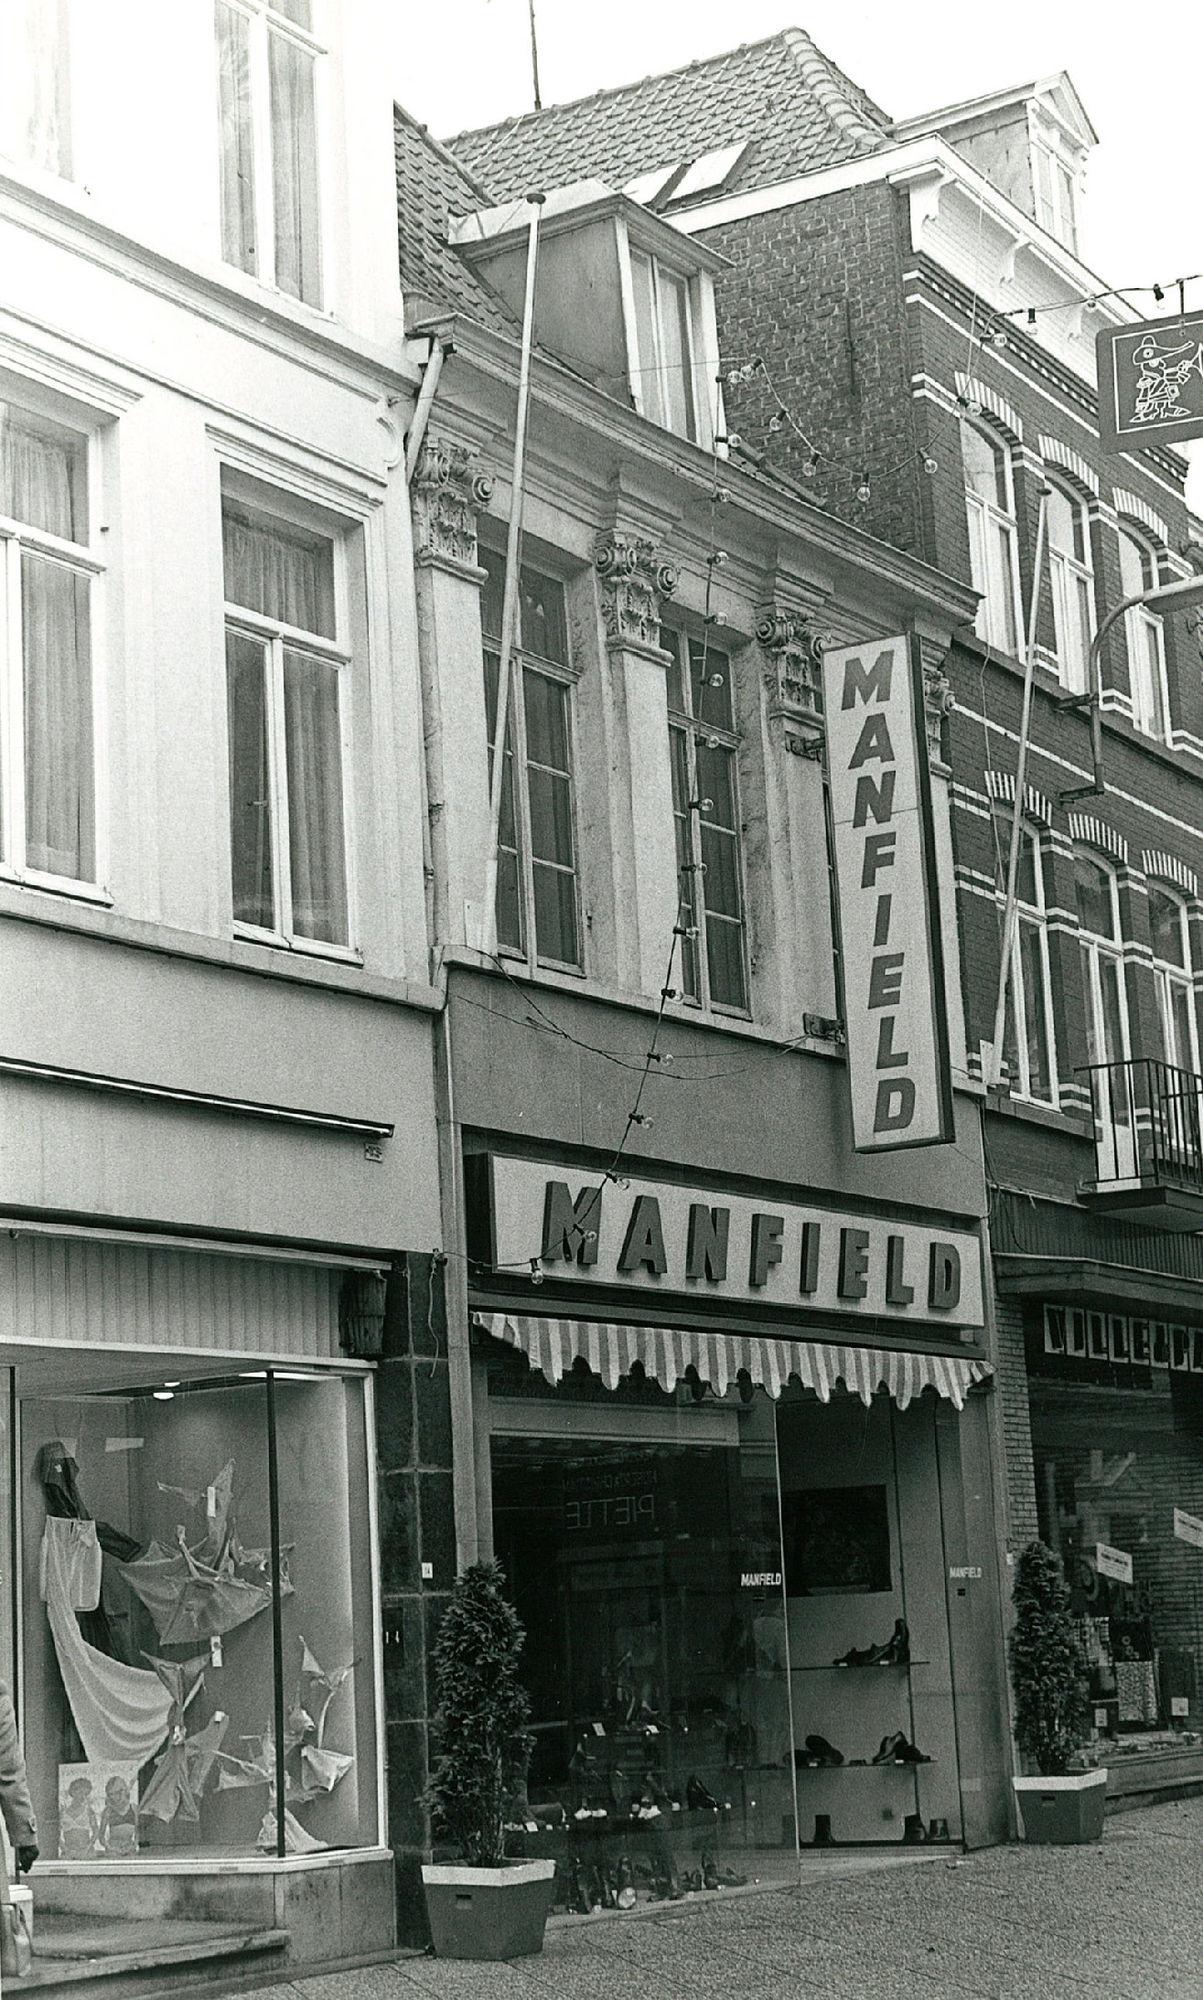 Winkel Manfield in de Korte Steenstraat